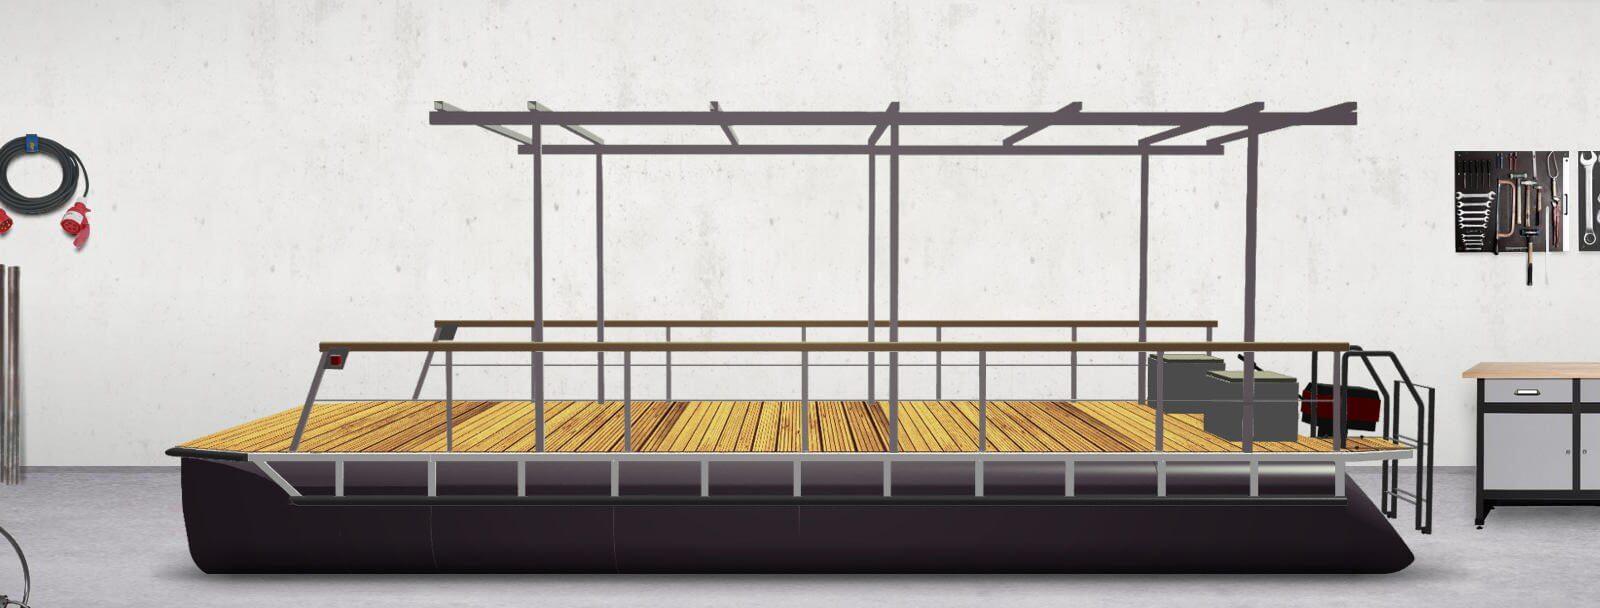 pontoon boat with a flatroof framework